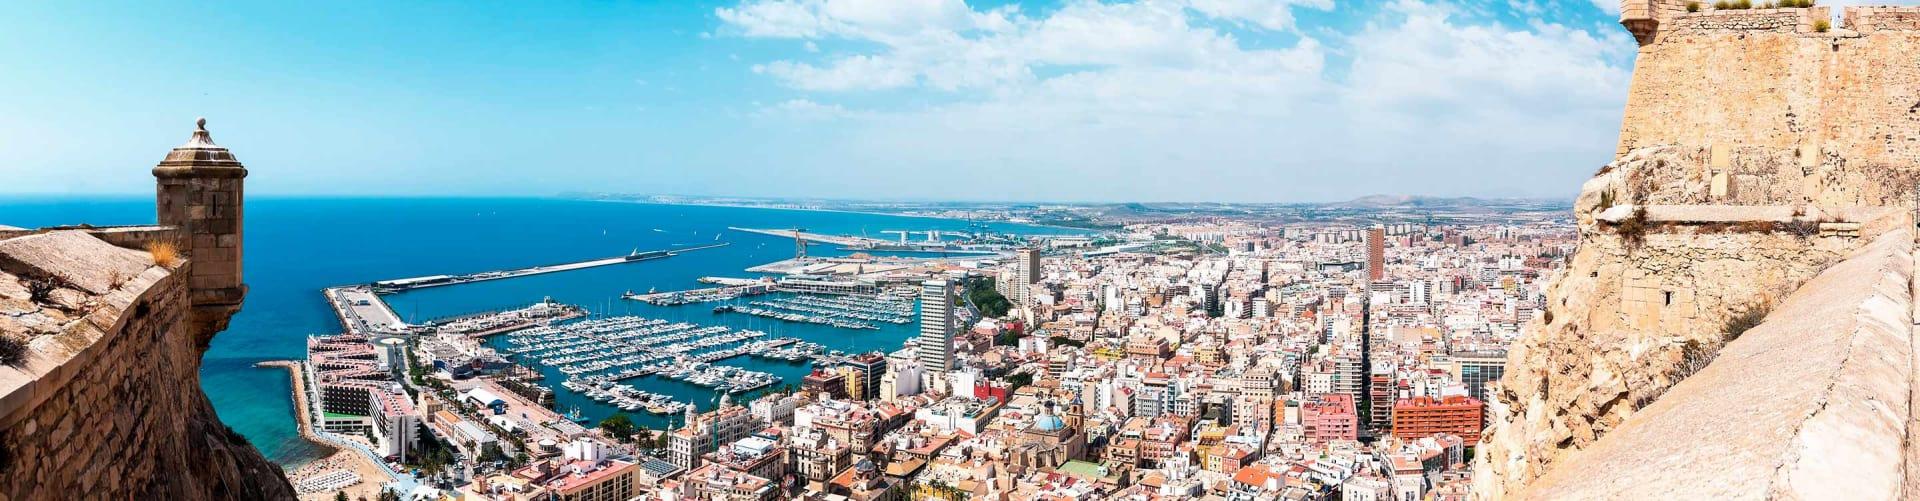 Viviendas en Alicante por menos de 50.000 euros